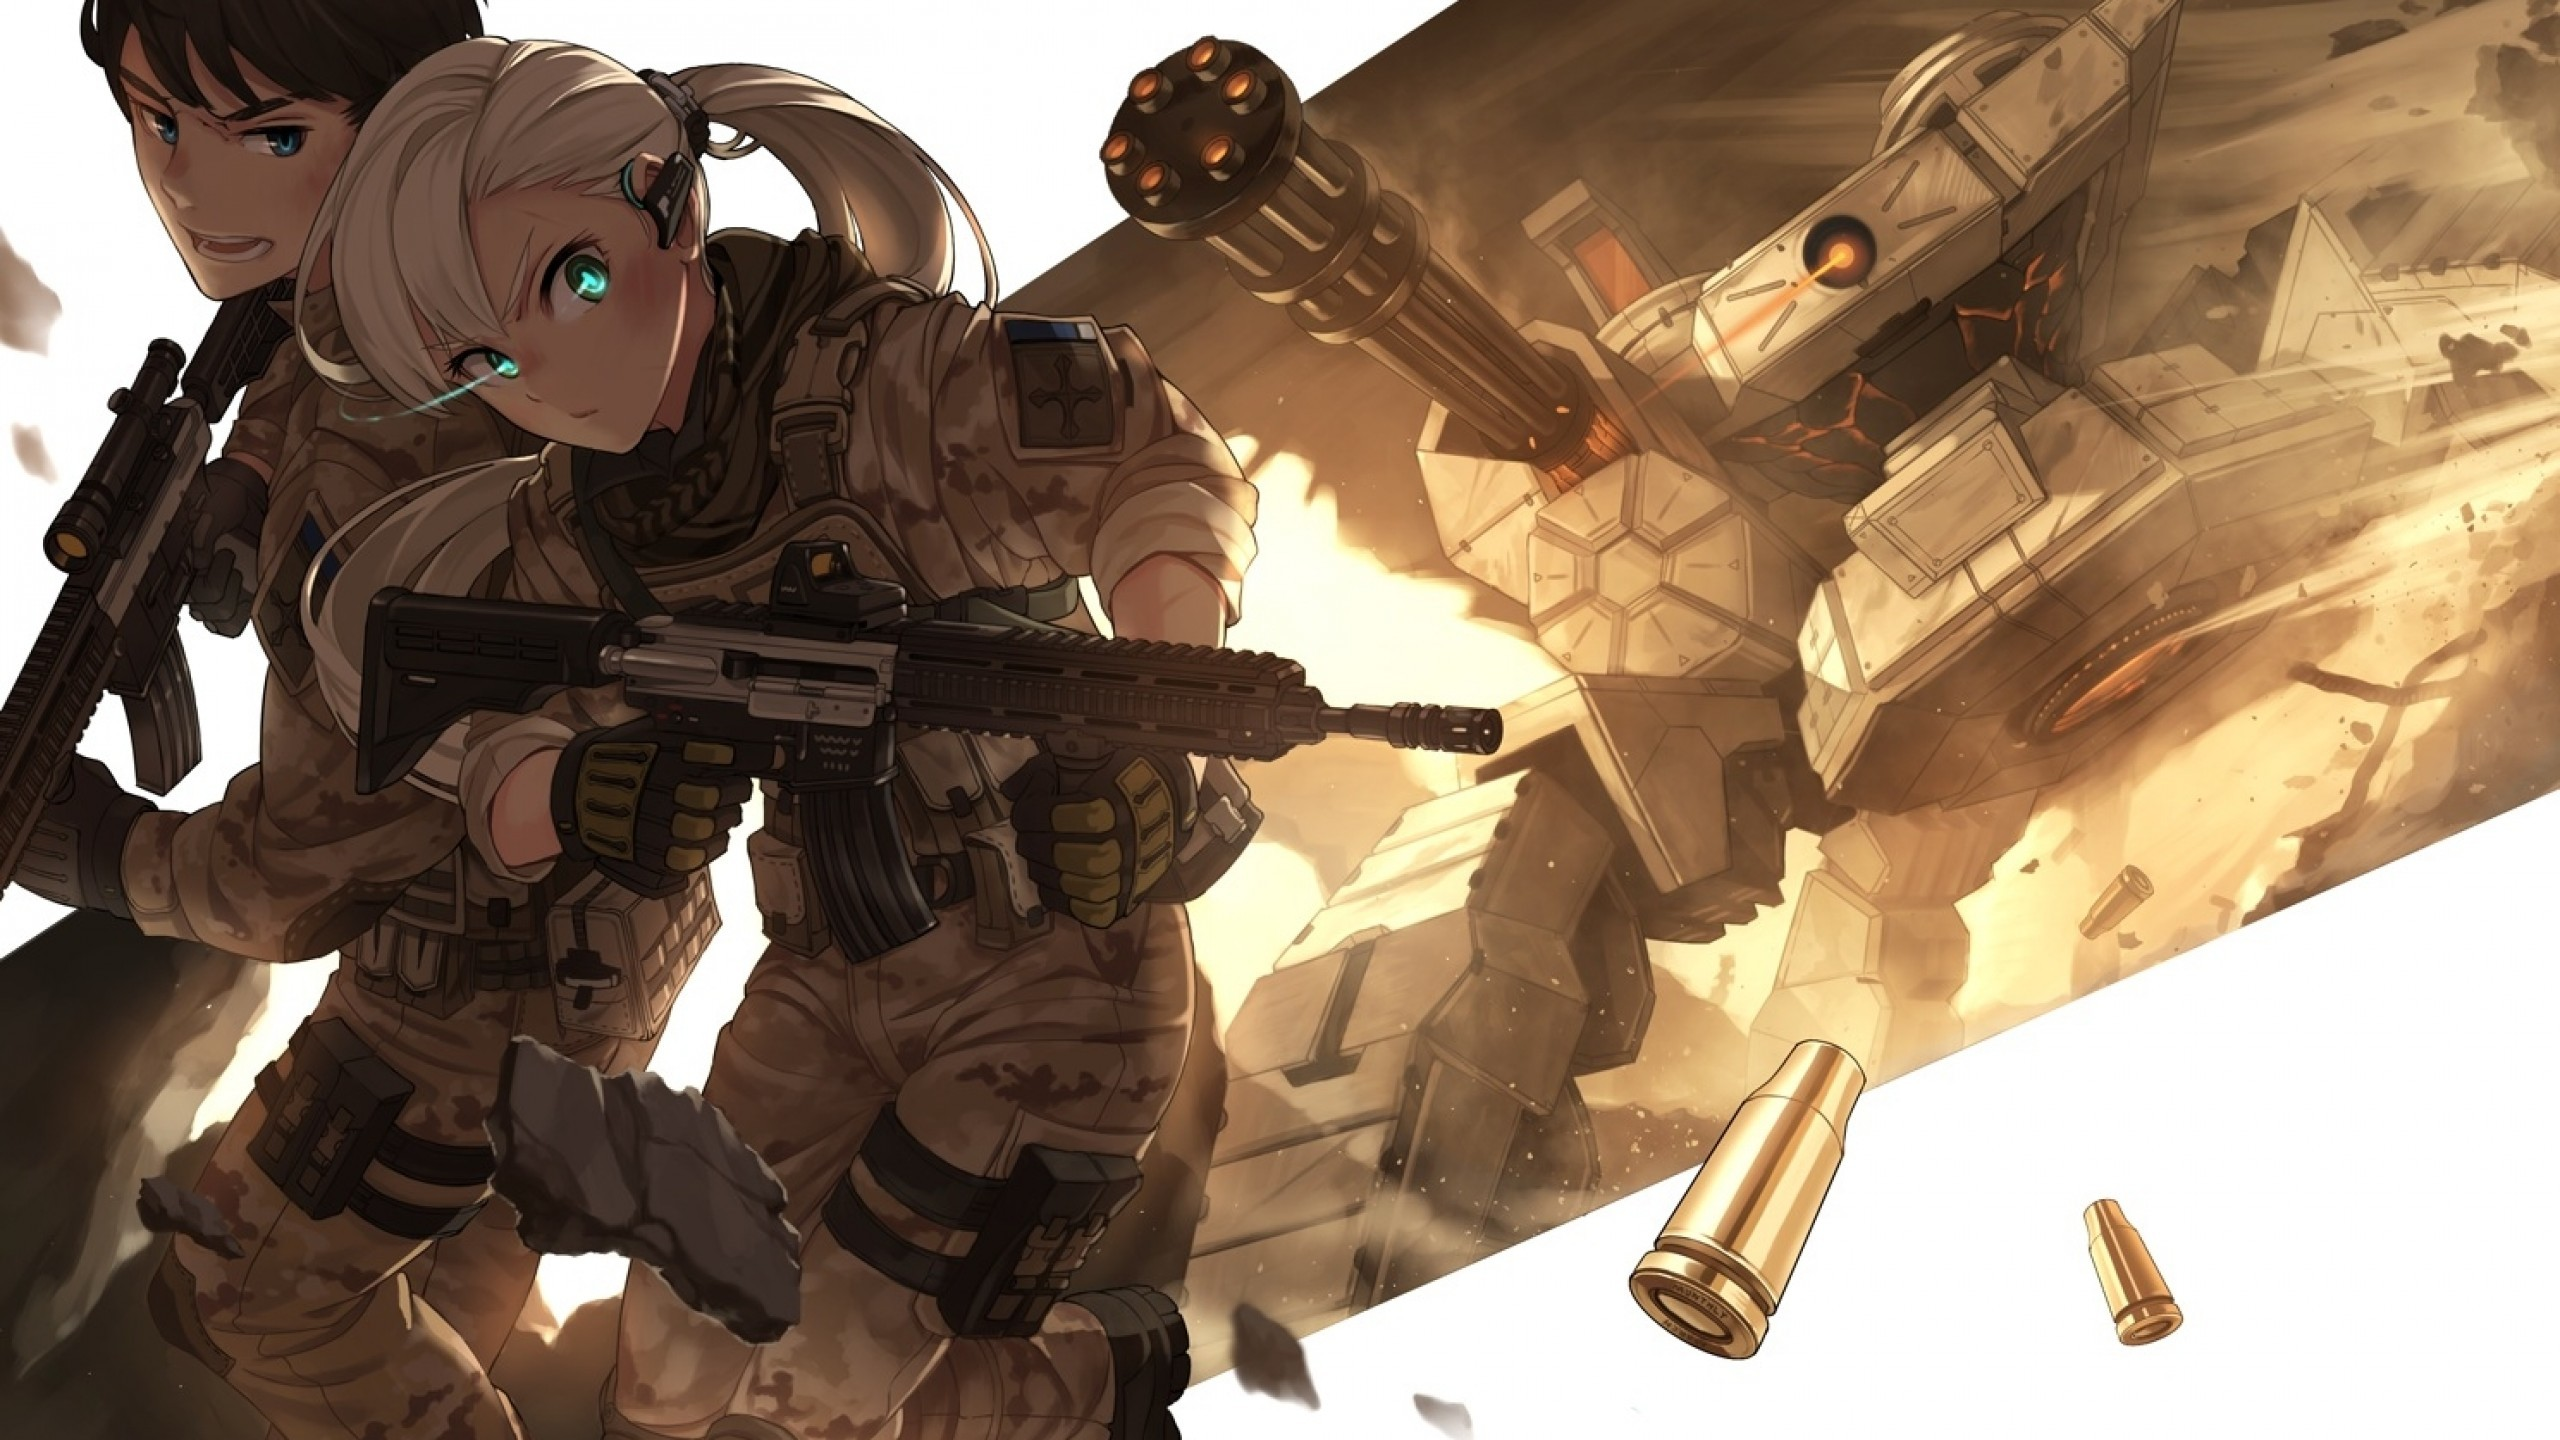 Anime Girl, Military, Soldier, Anime Boy, Guns, White Hair, Battle